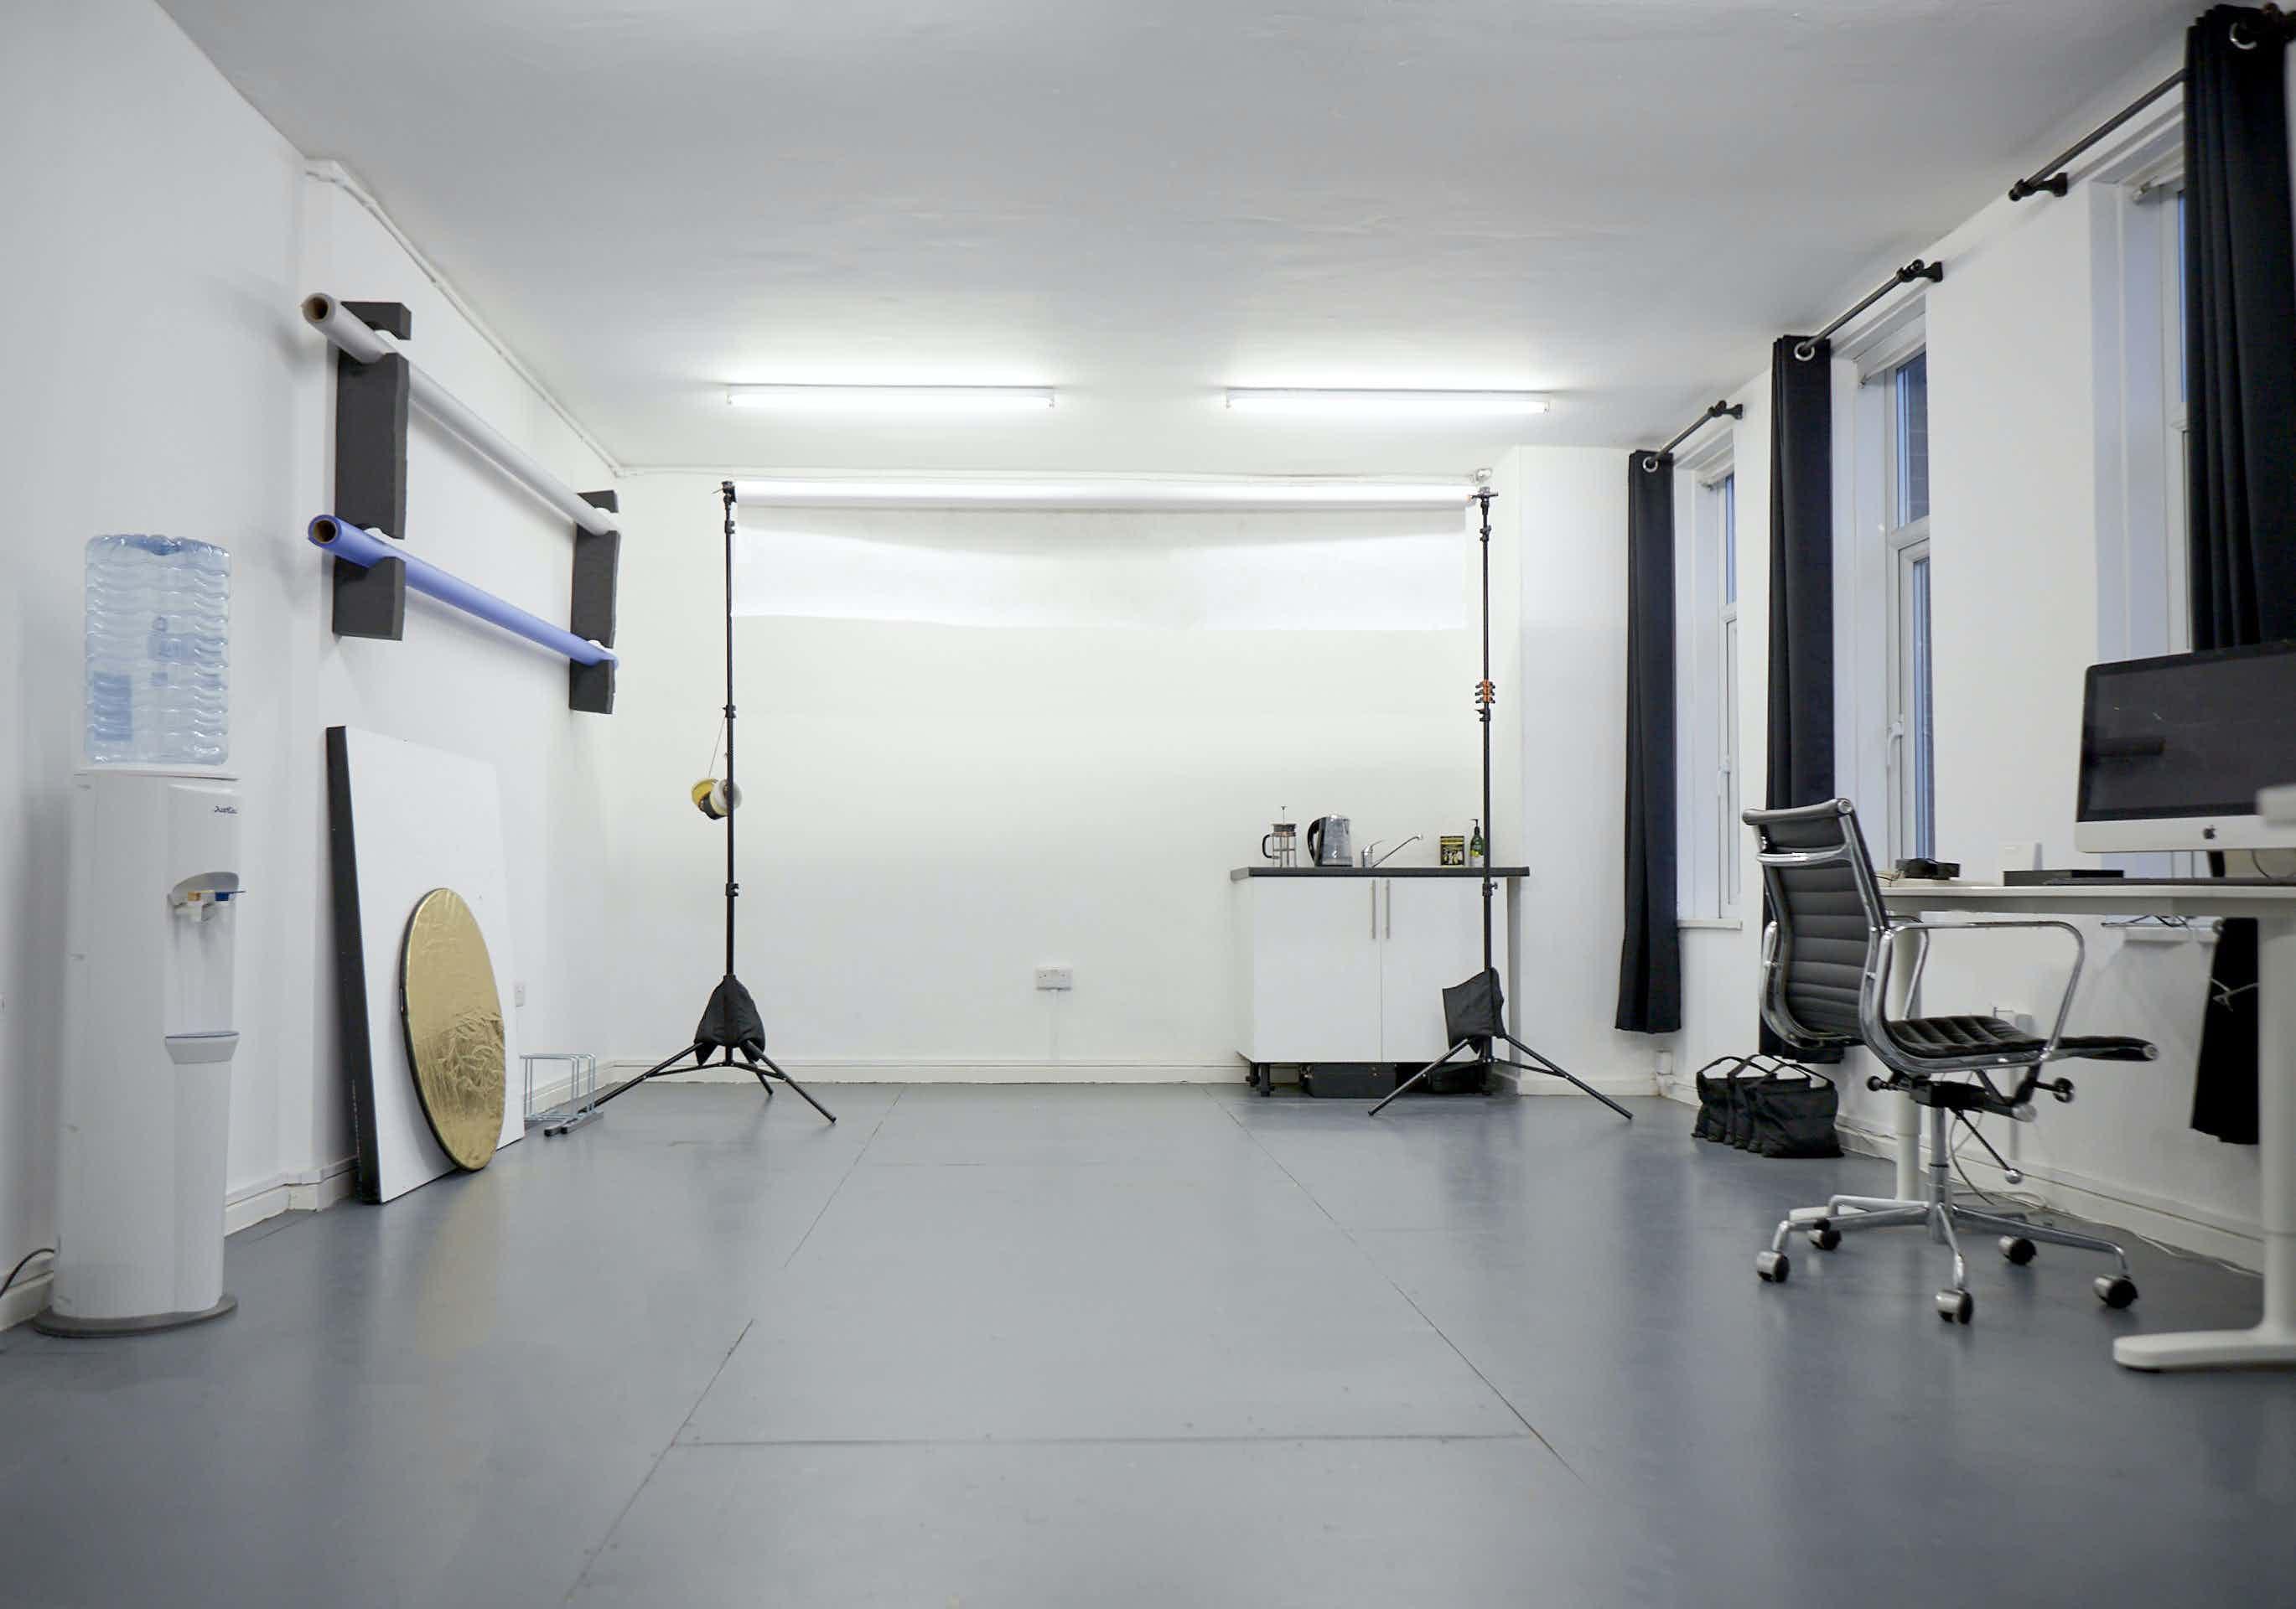 Daylight Photo Studio, Modular